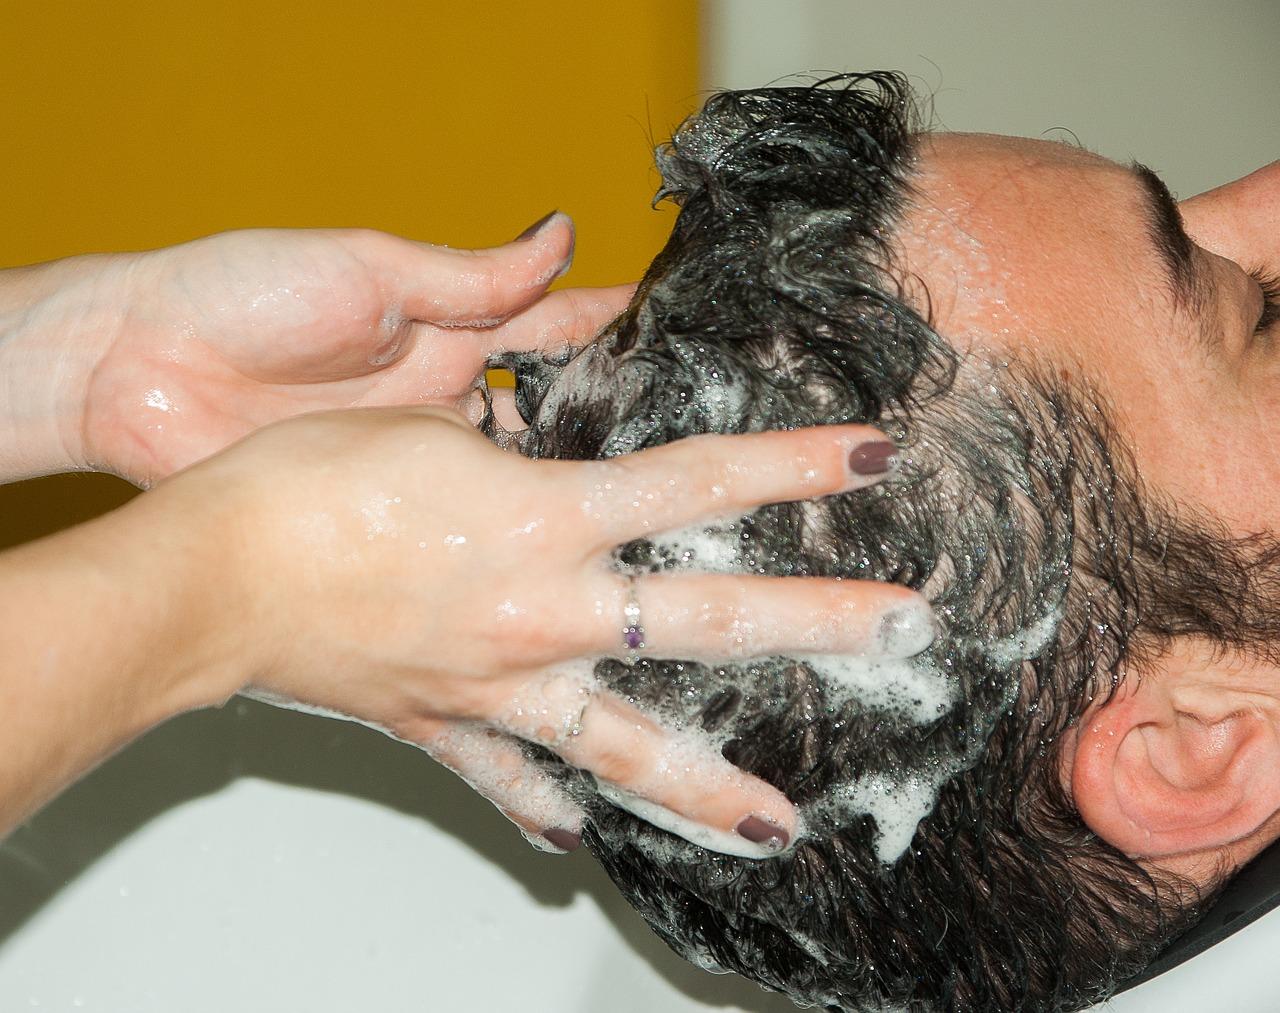 fejbőr hidratáló pikkelysömörhöz)